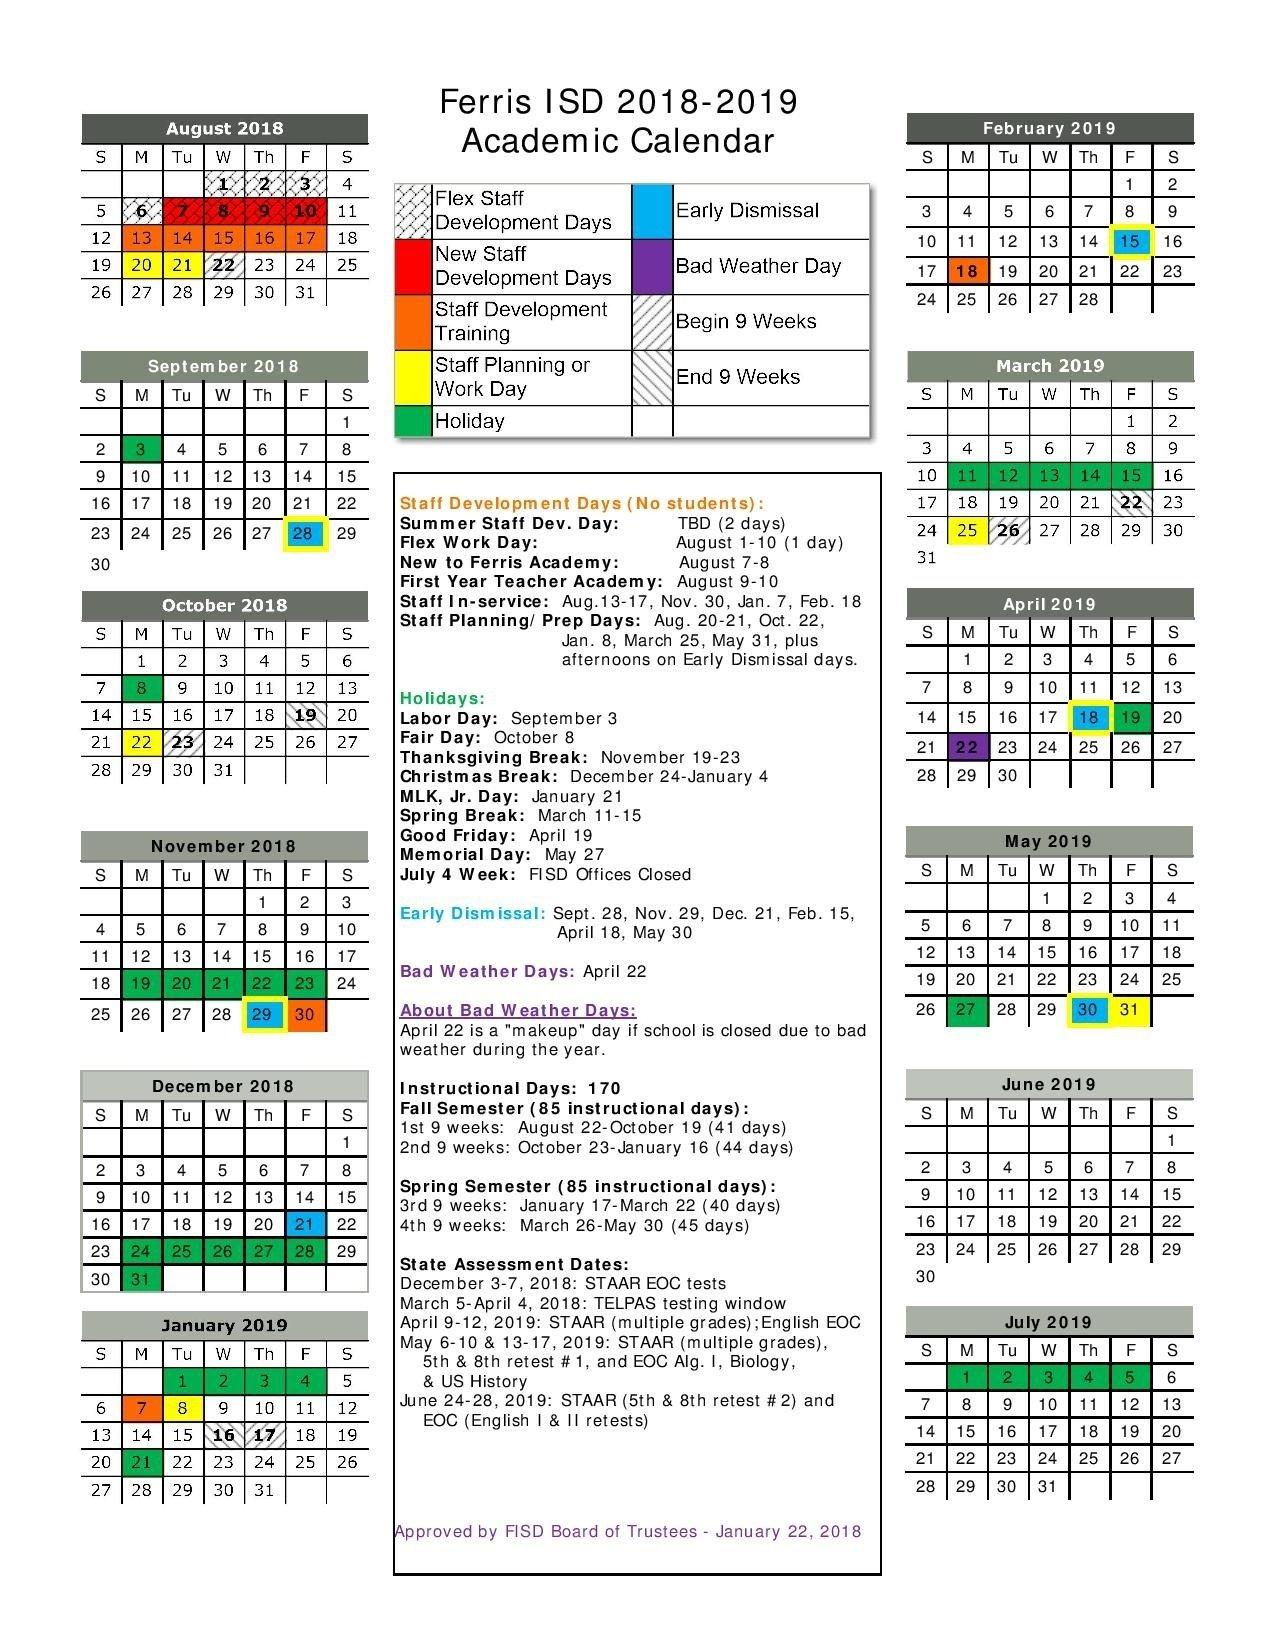 Remarkable District 6 School Calendar 2019 • Printable Blank District 6 Calendar 2019